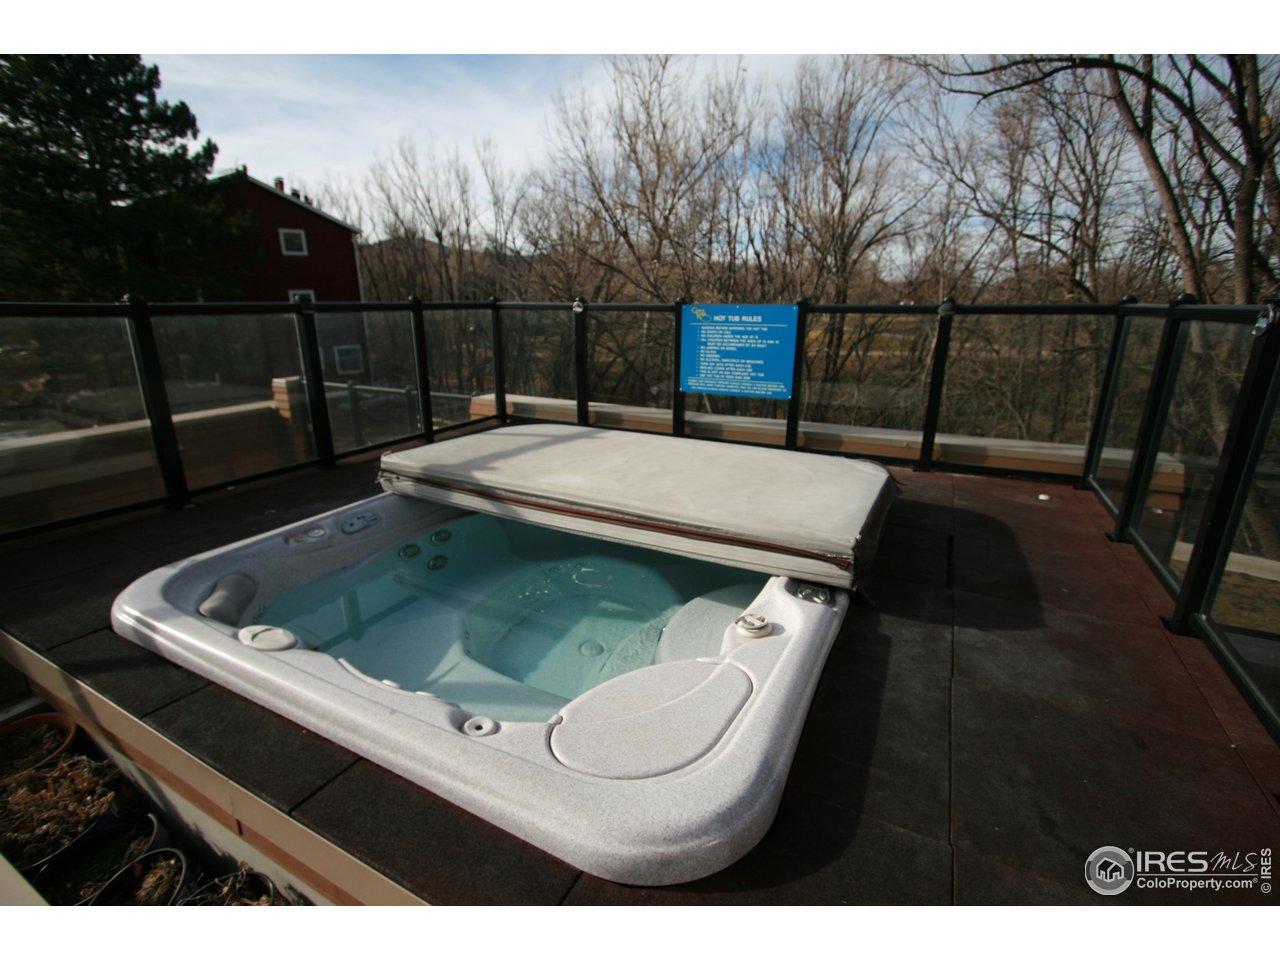 Outdoor Hot Tub